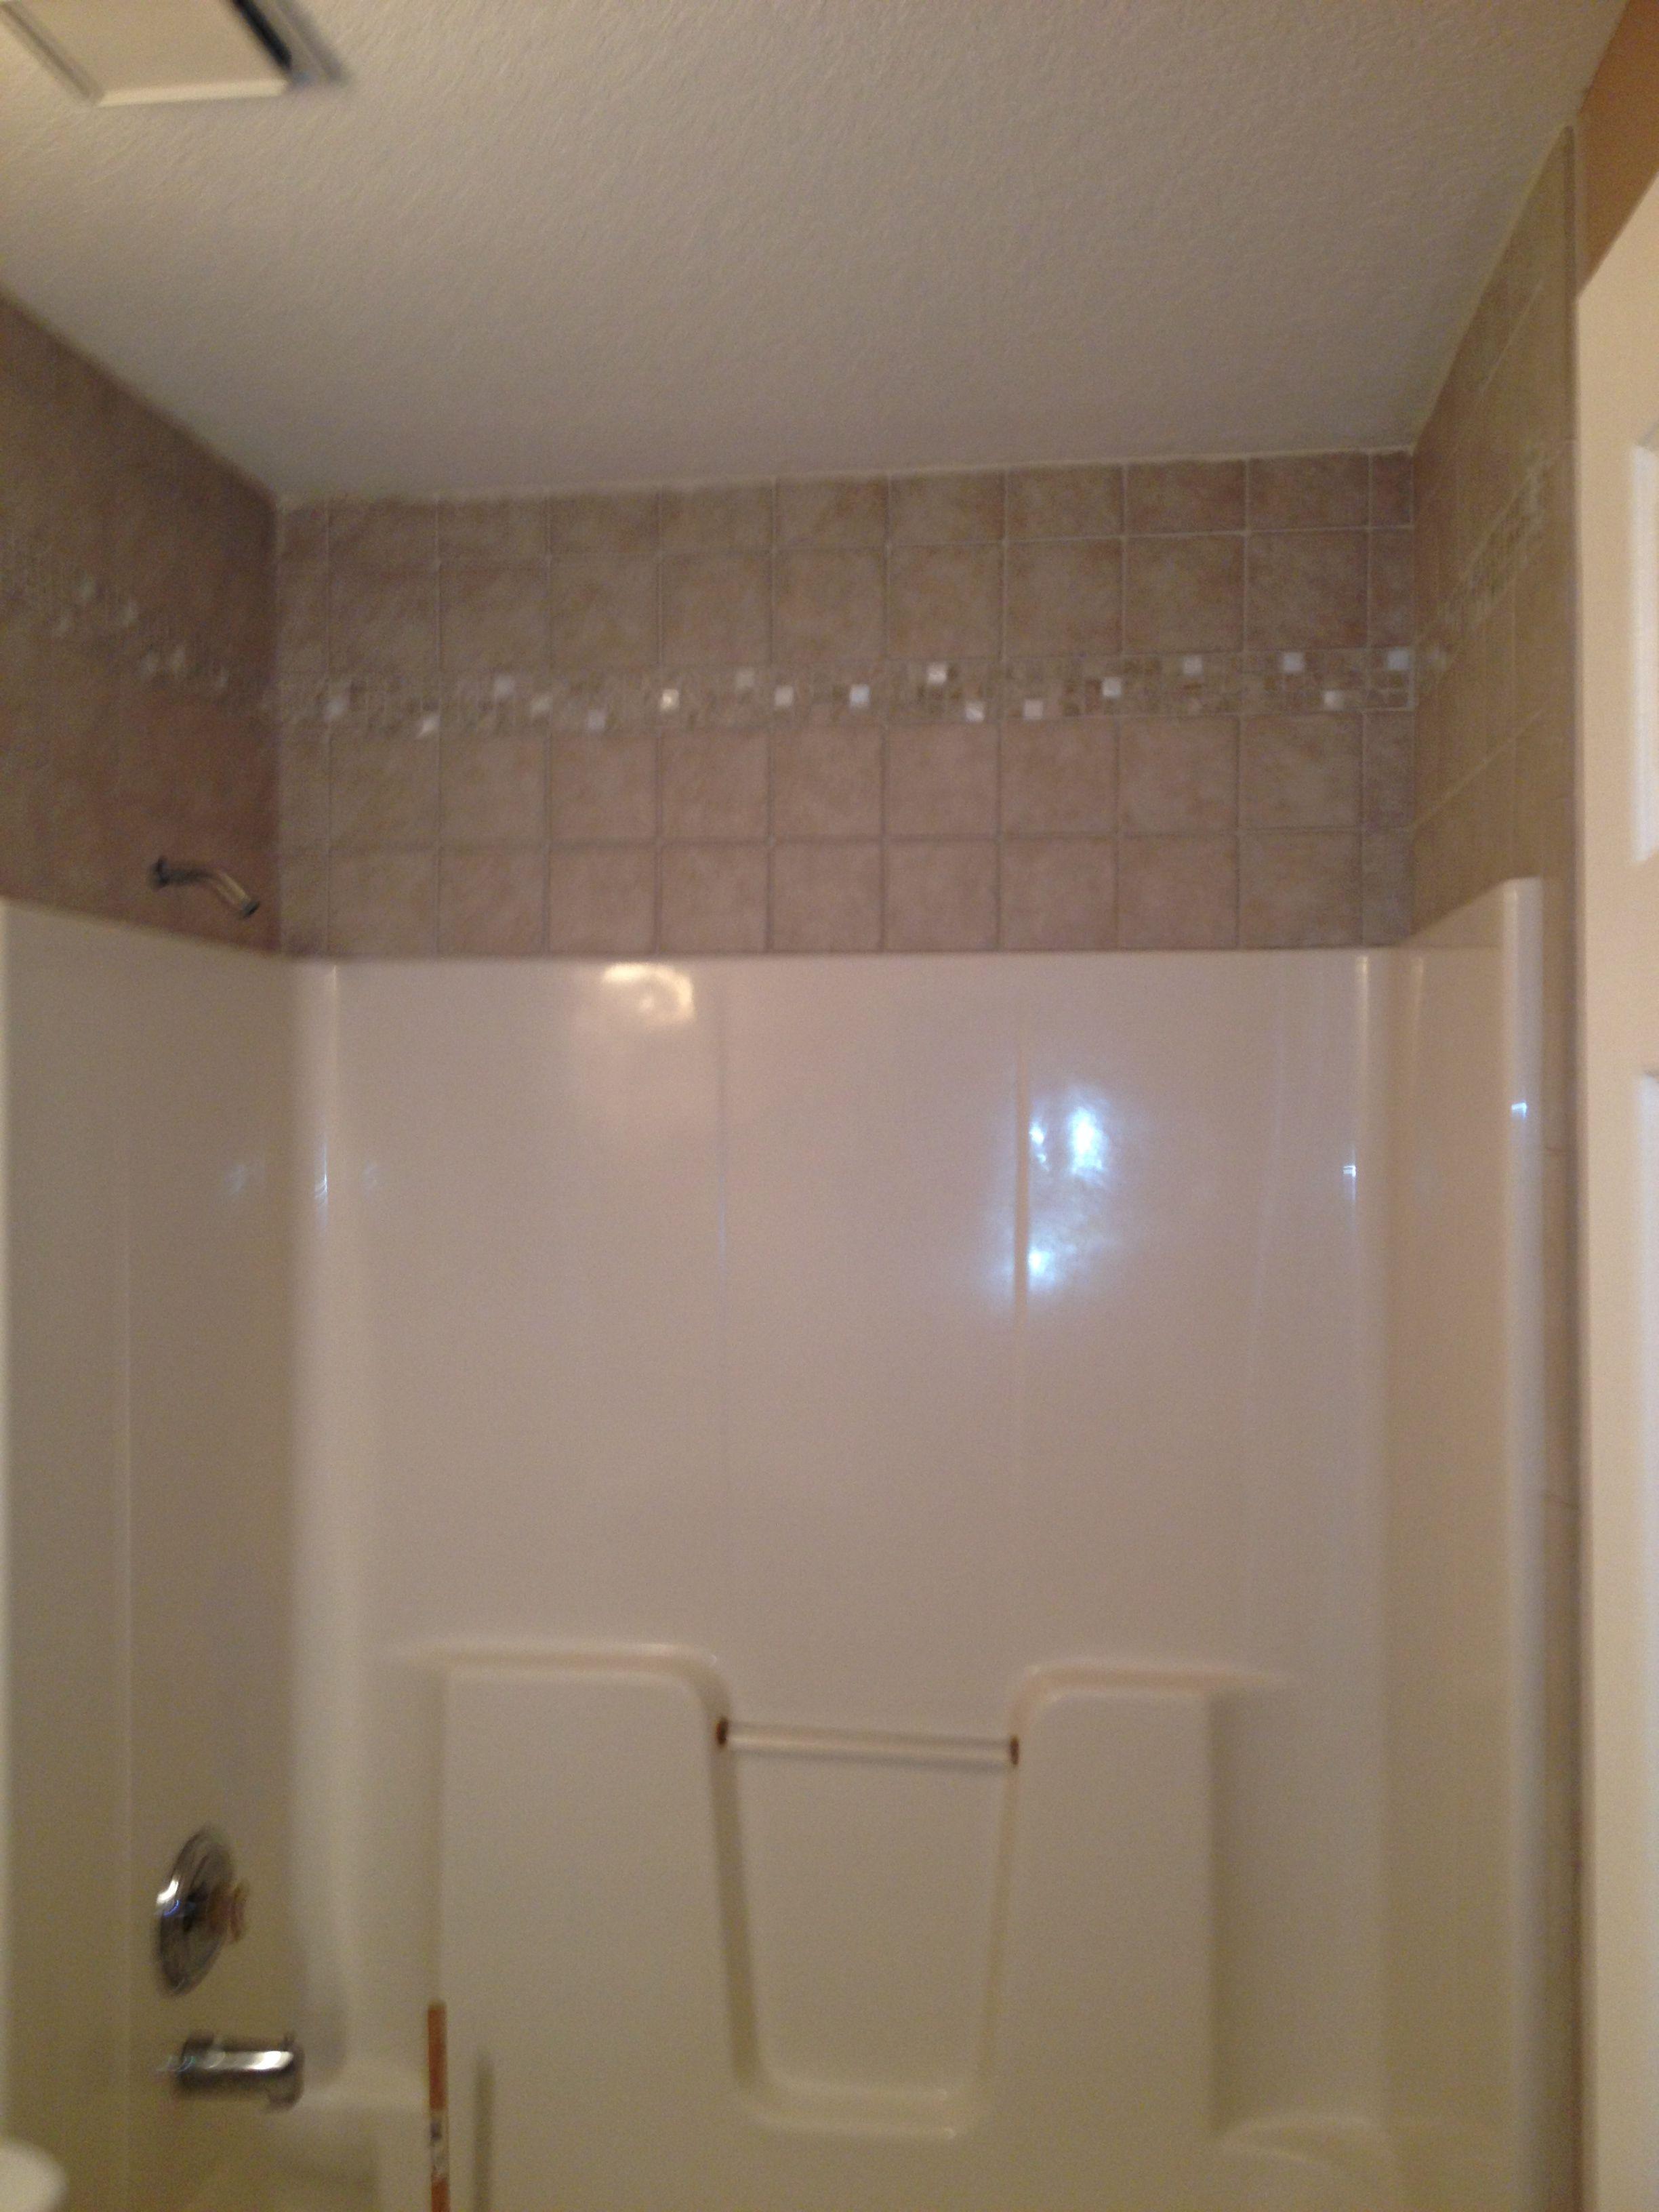 Tile Around The The Fiberglass Tub Bathrooms Remodel